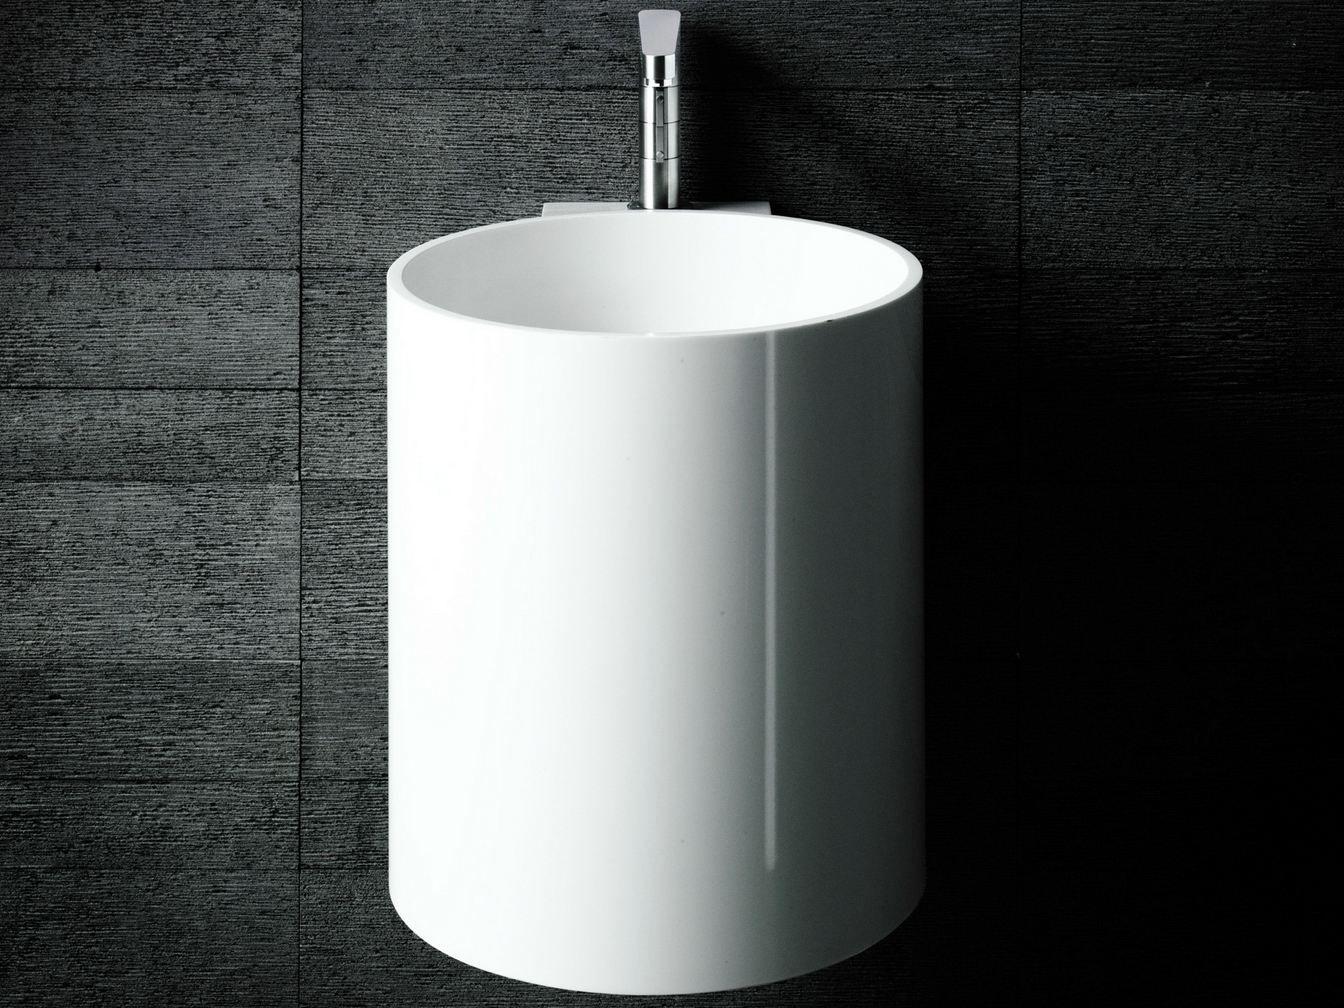 lave mains suspendu en corian rond phw by boffi design. Black Bedroom Furniture Sets. Home Design Ideas